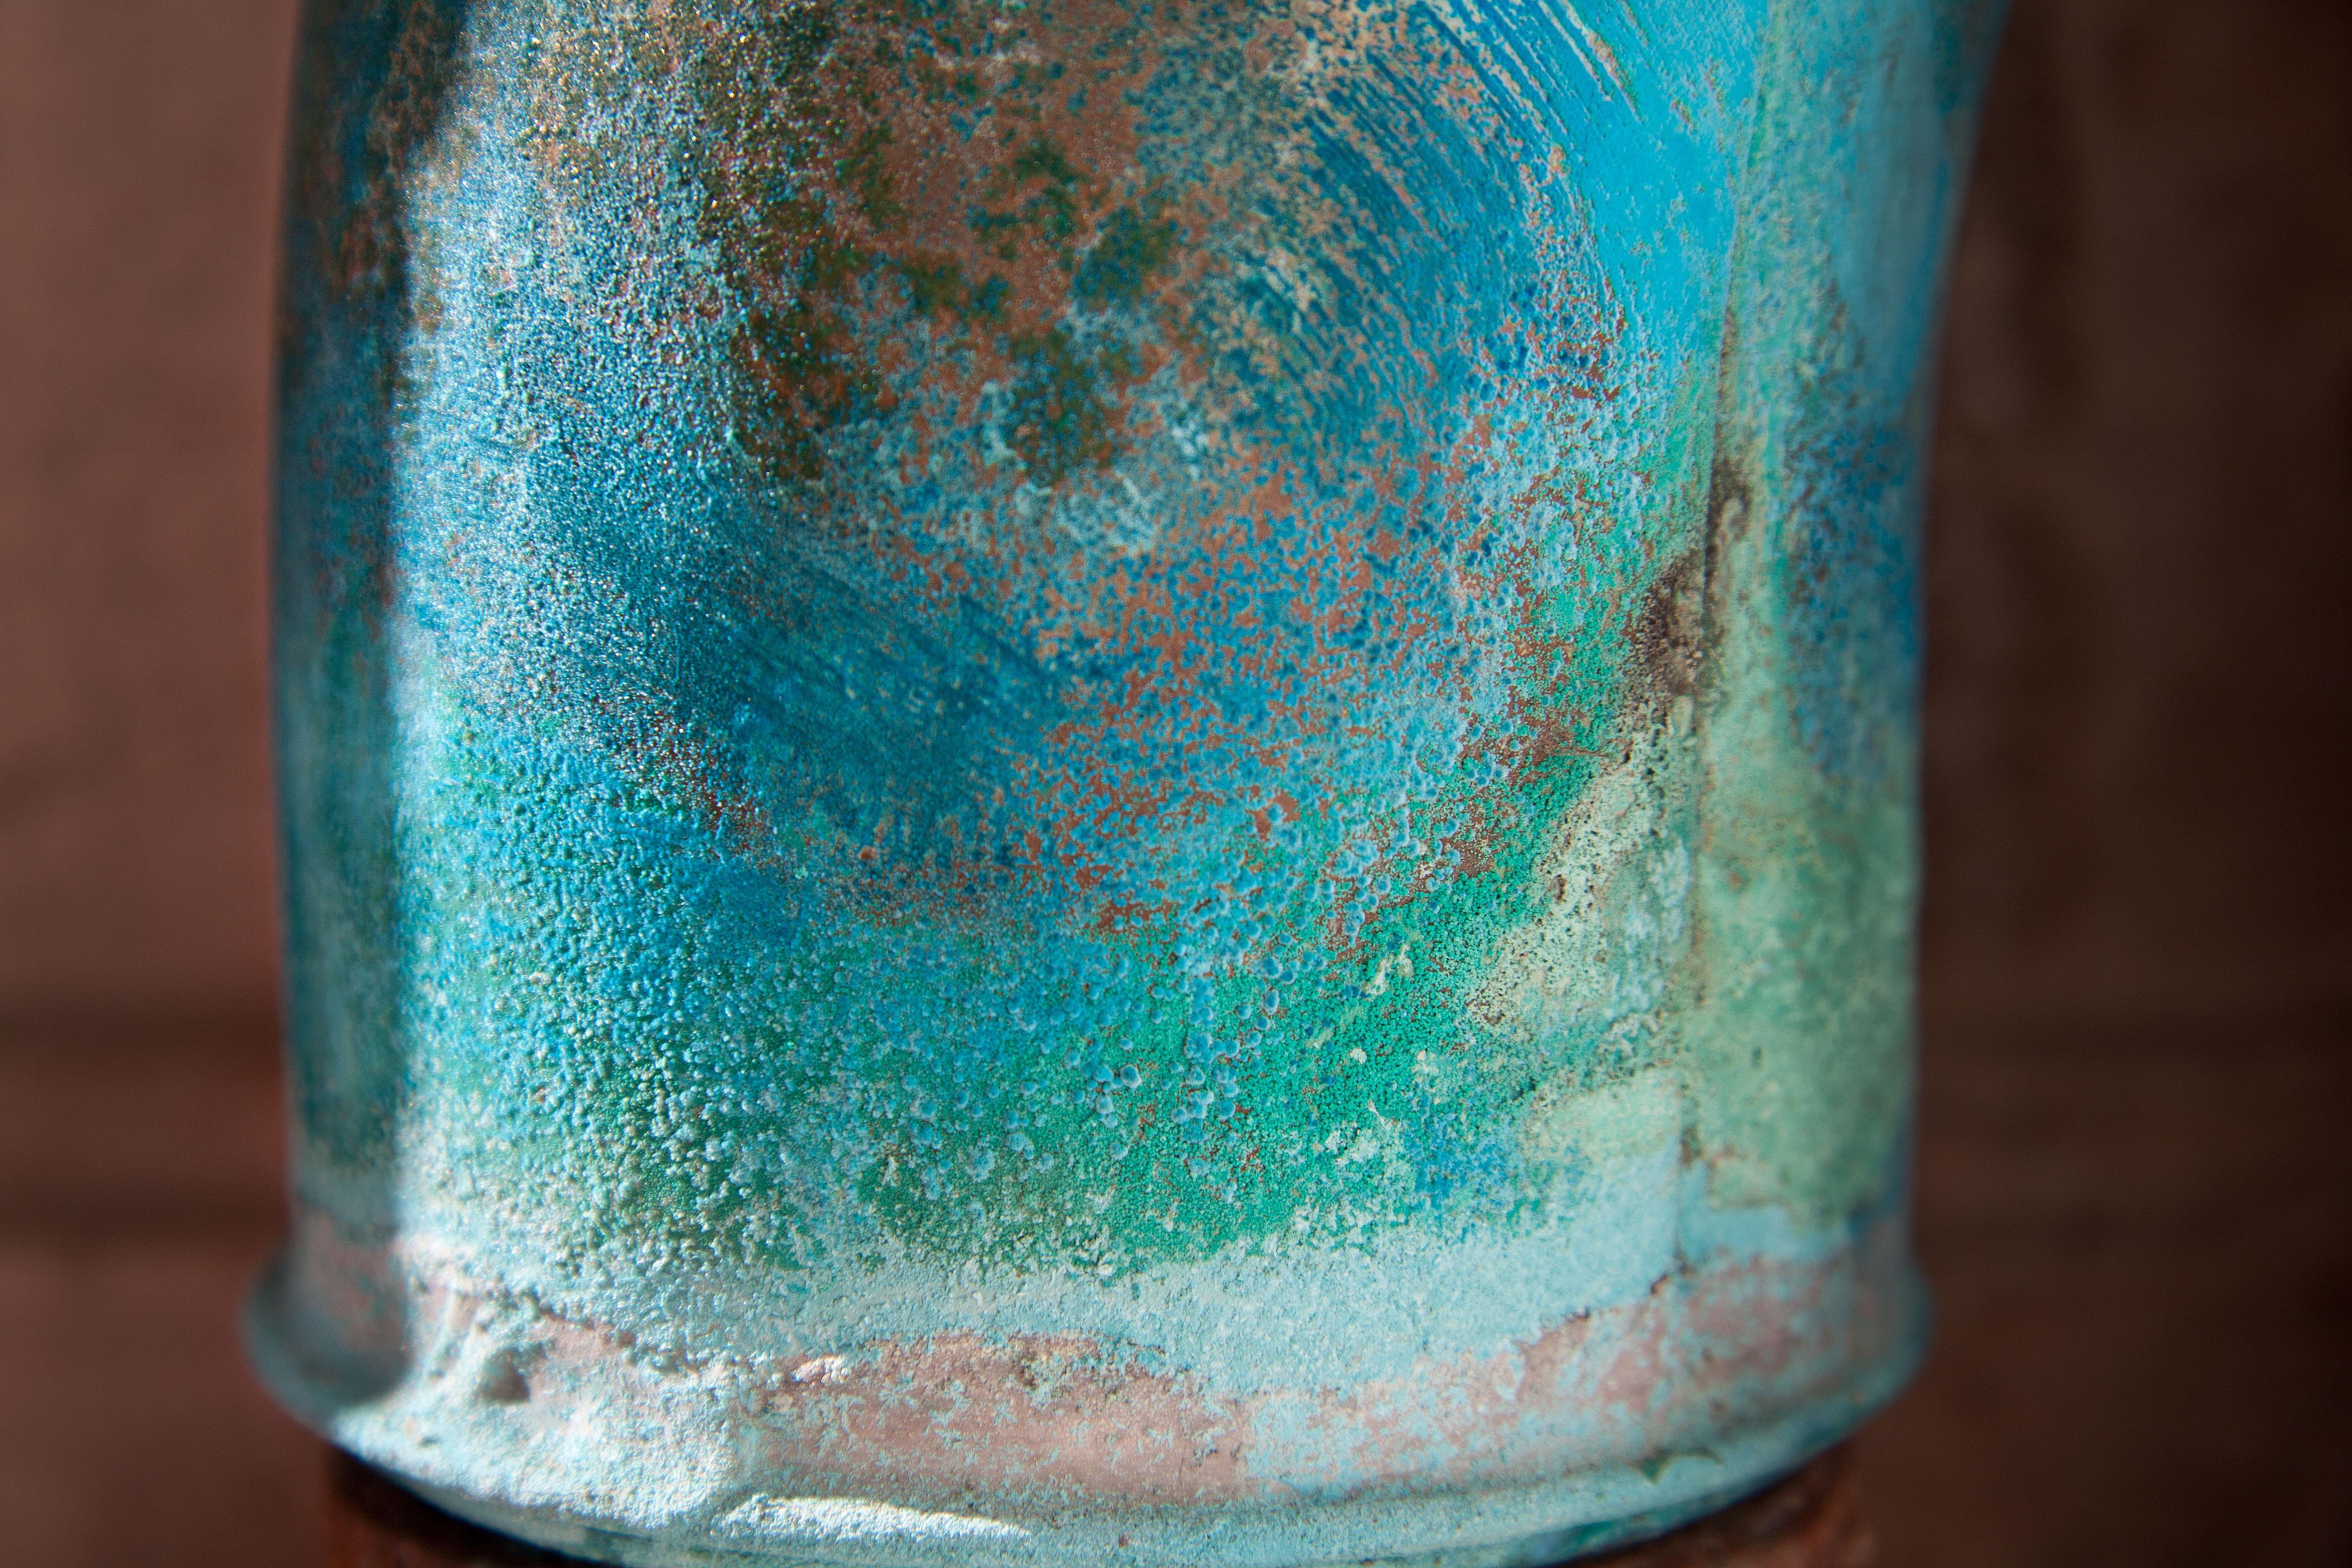 Kostenlose Foto Glas Alt Vase Grün Farbe Keramik Blau